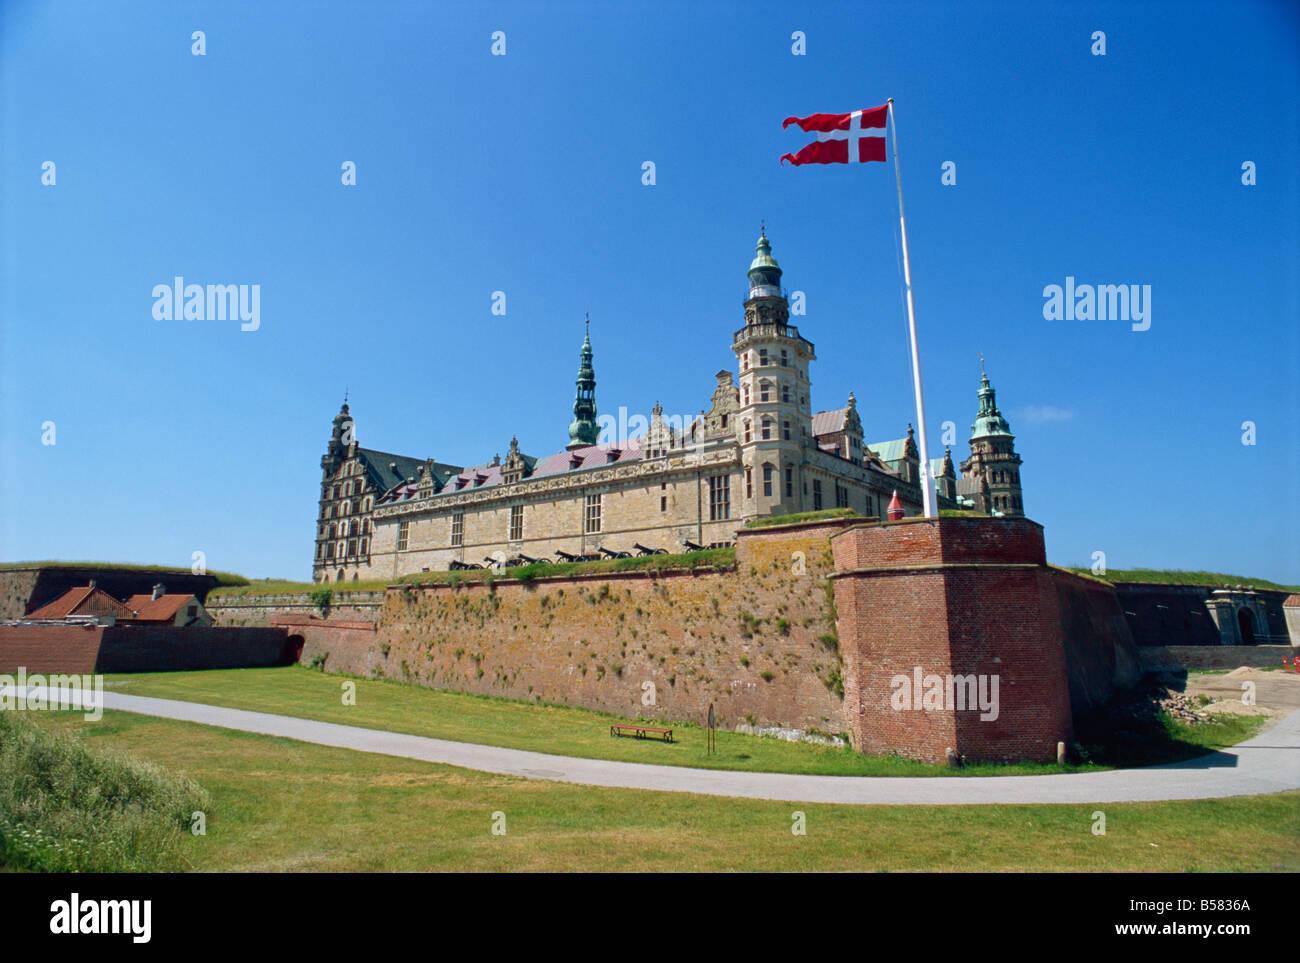 Kronborg Castle, Helsingor (Elsinore), Hamlet's castle, UNESCO World Heritage Site, Denmark, Scandinavia, Europe Stock Photo